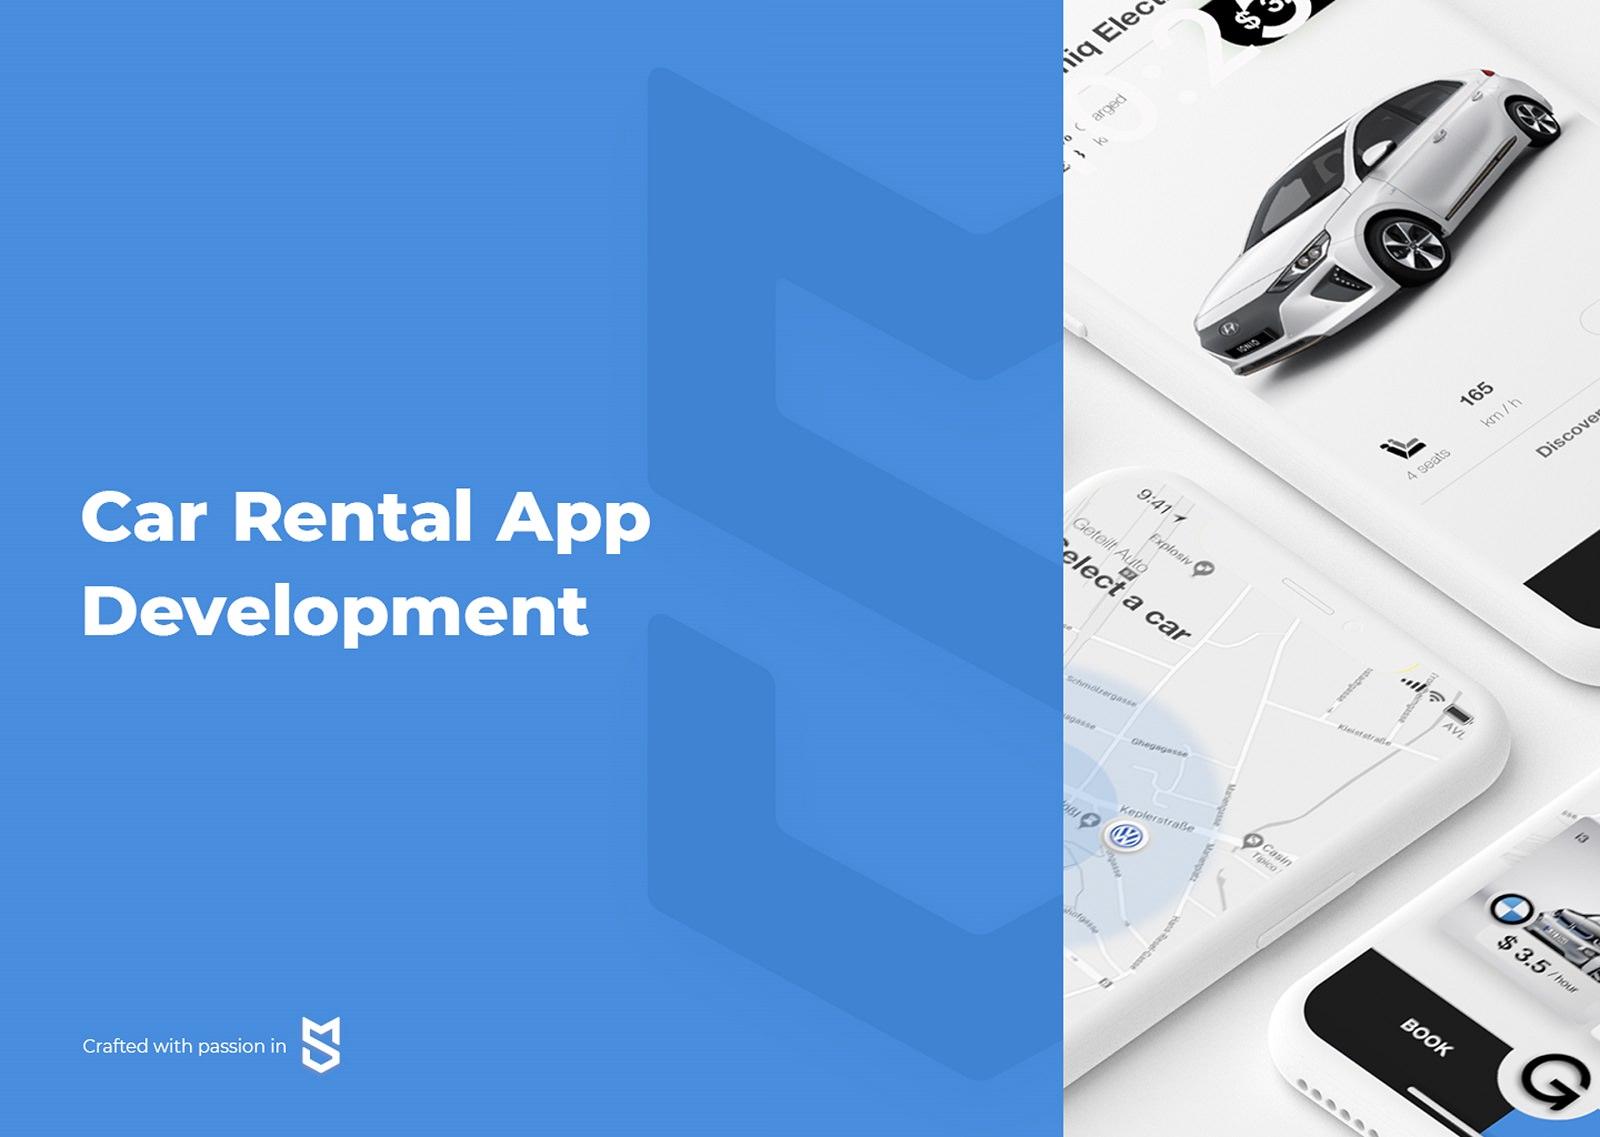 How to Make Car Rental App like Turo, Avis or Hertz? - Mind